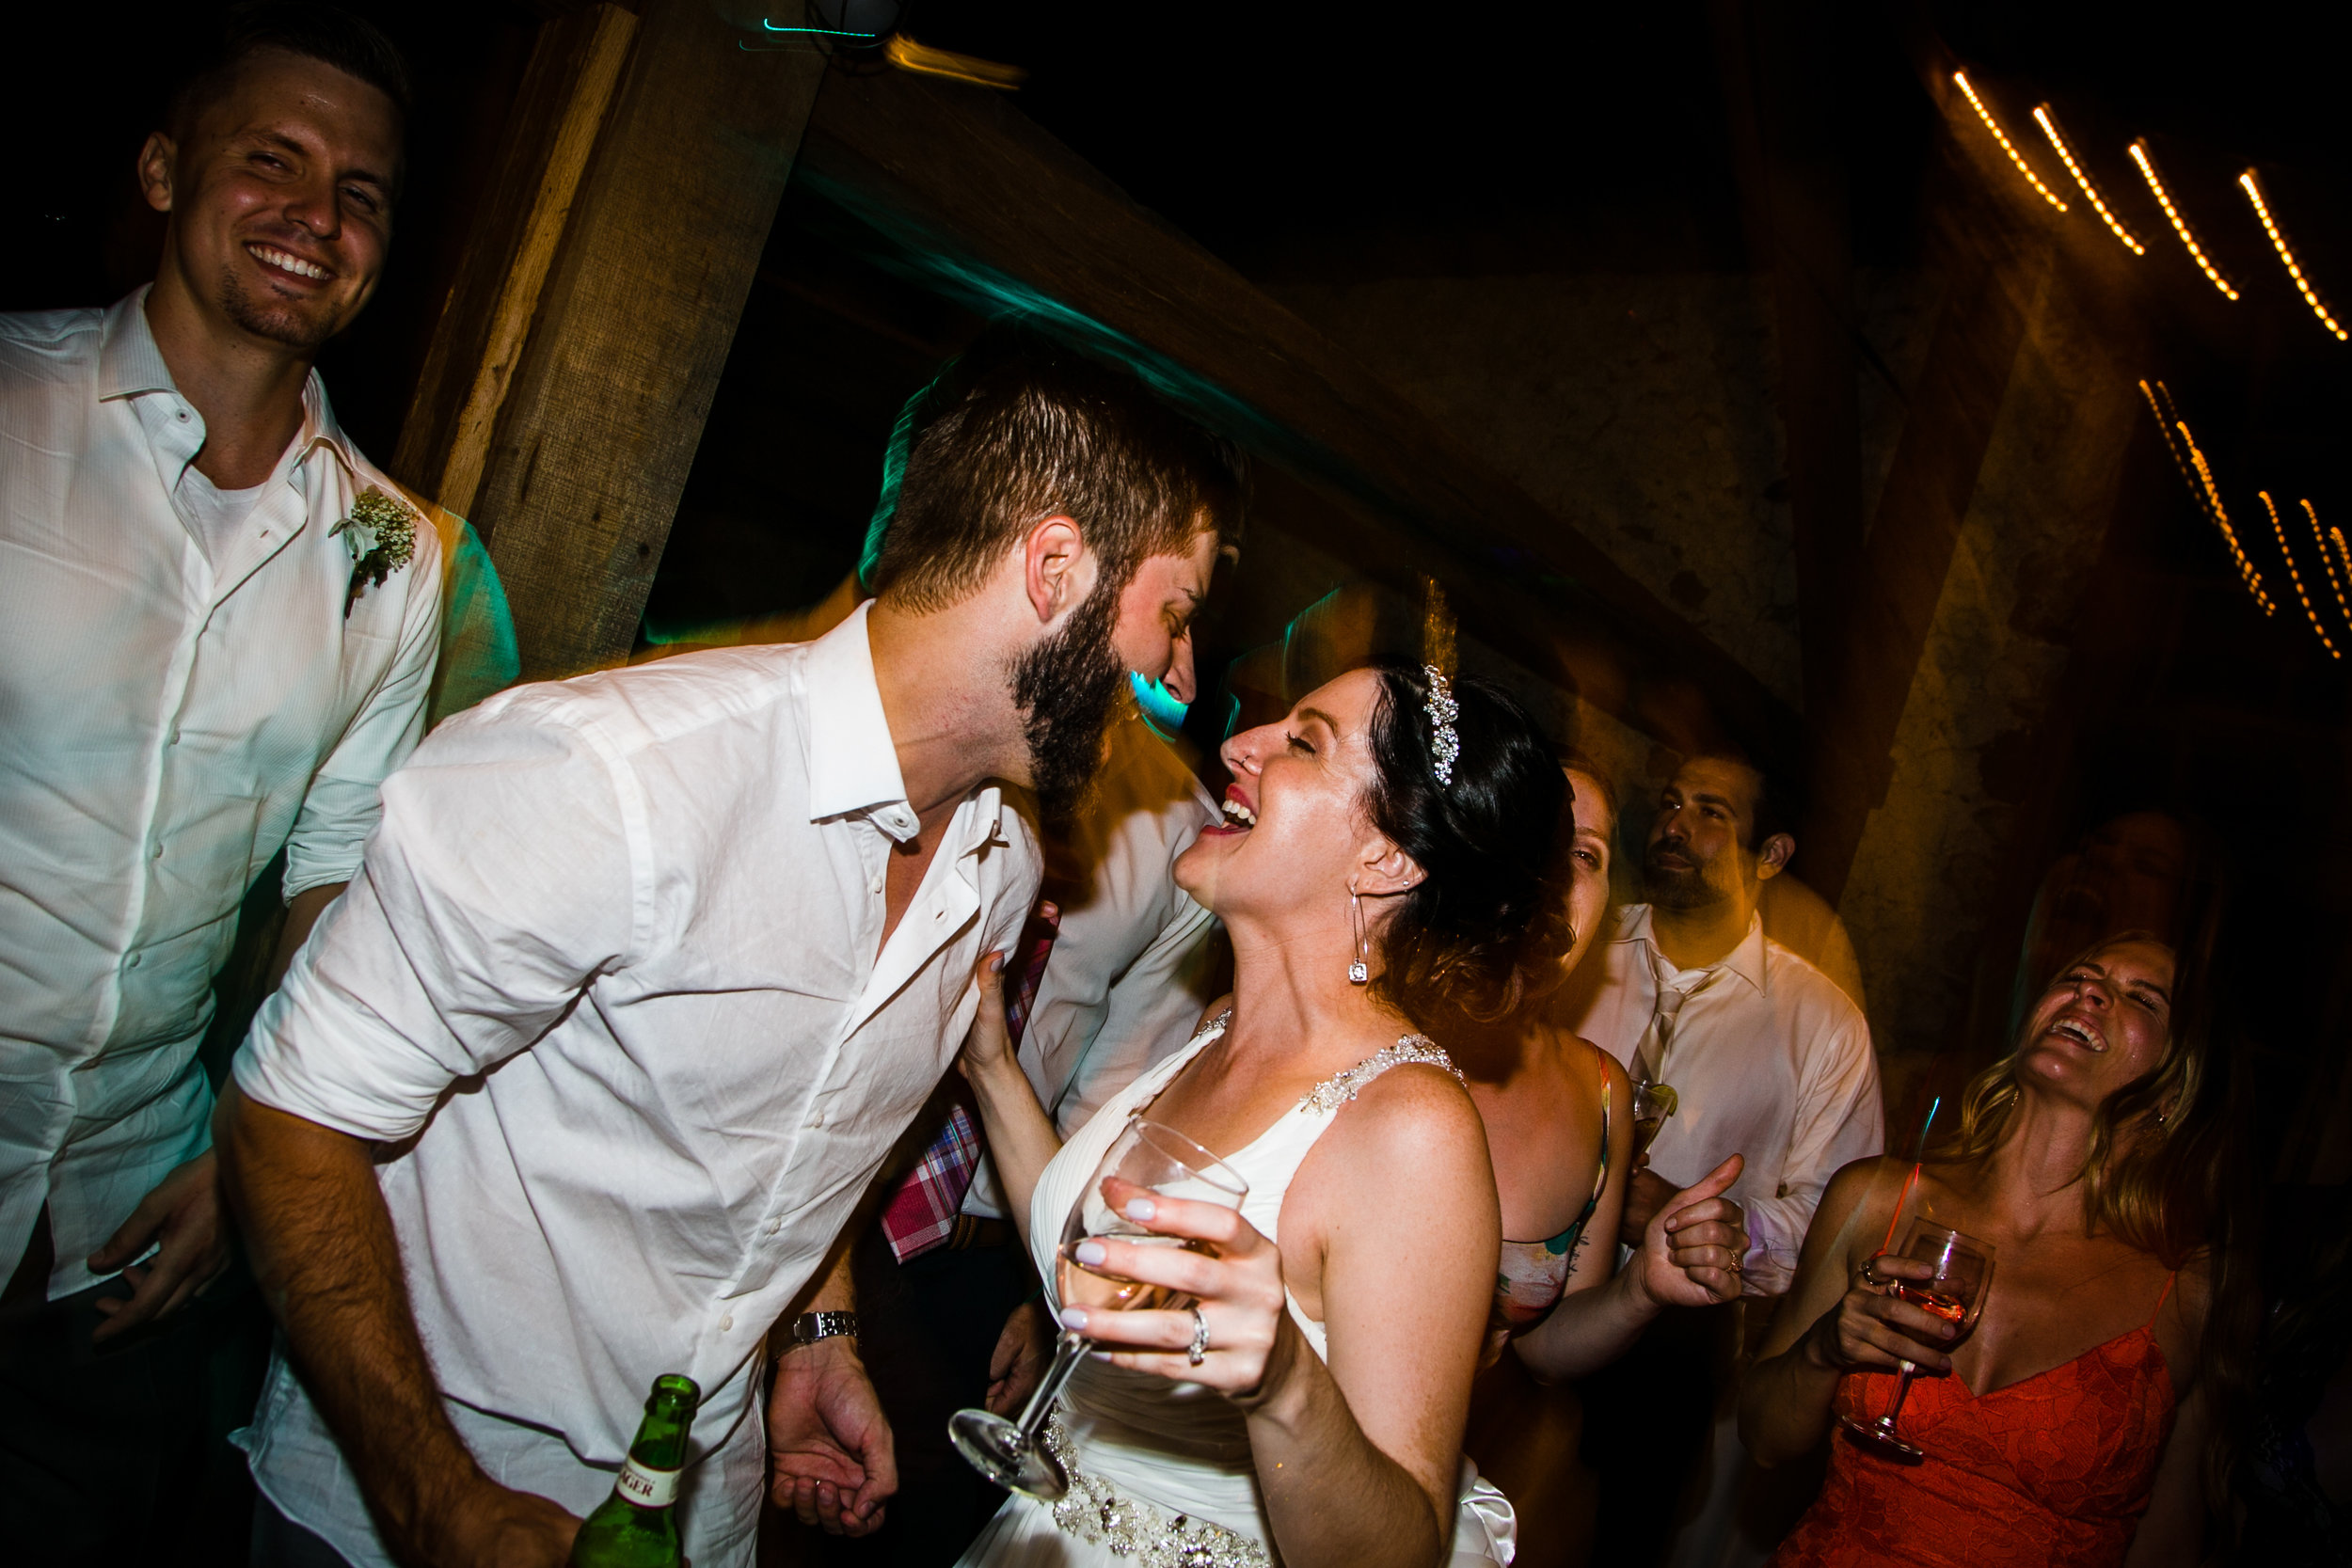 TYLER ARBORETUM WEDDING PHOTOGRAPHY LOVESTRUCK PICTURES-096.jpg